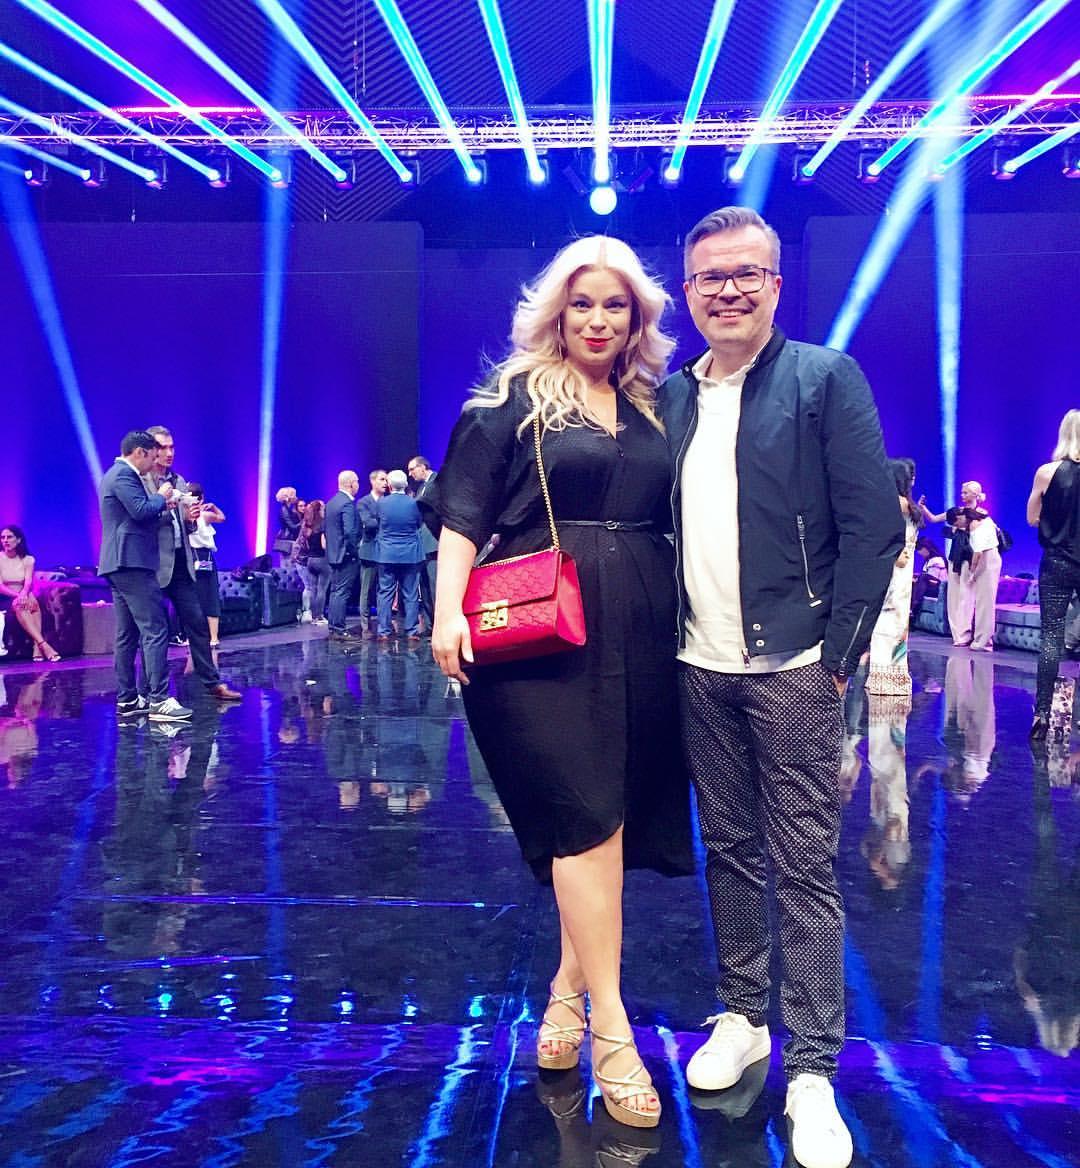 fashionweek-plus-size-Caterina-pogorzelski-Megabambi-Agency-call-plussizemodel-plussizeblogger